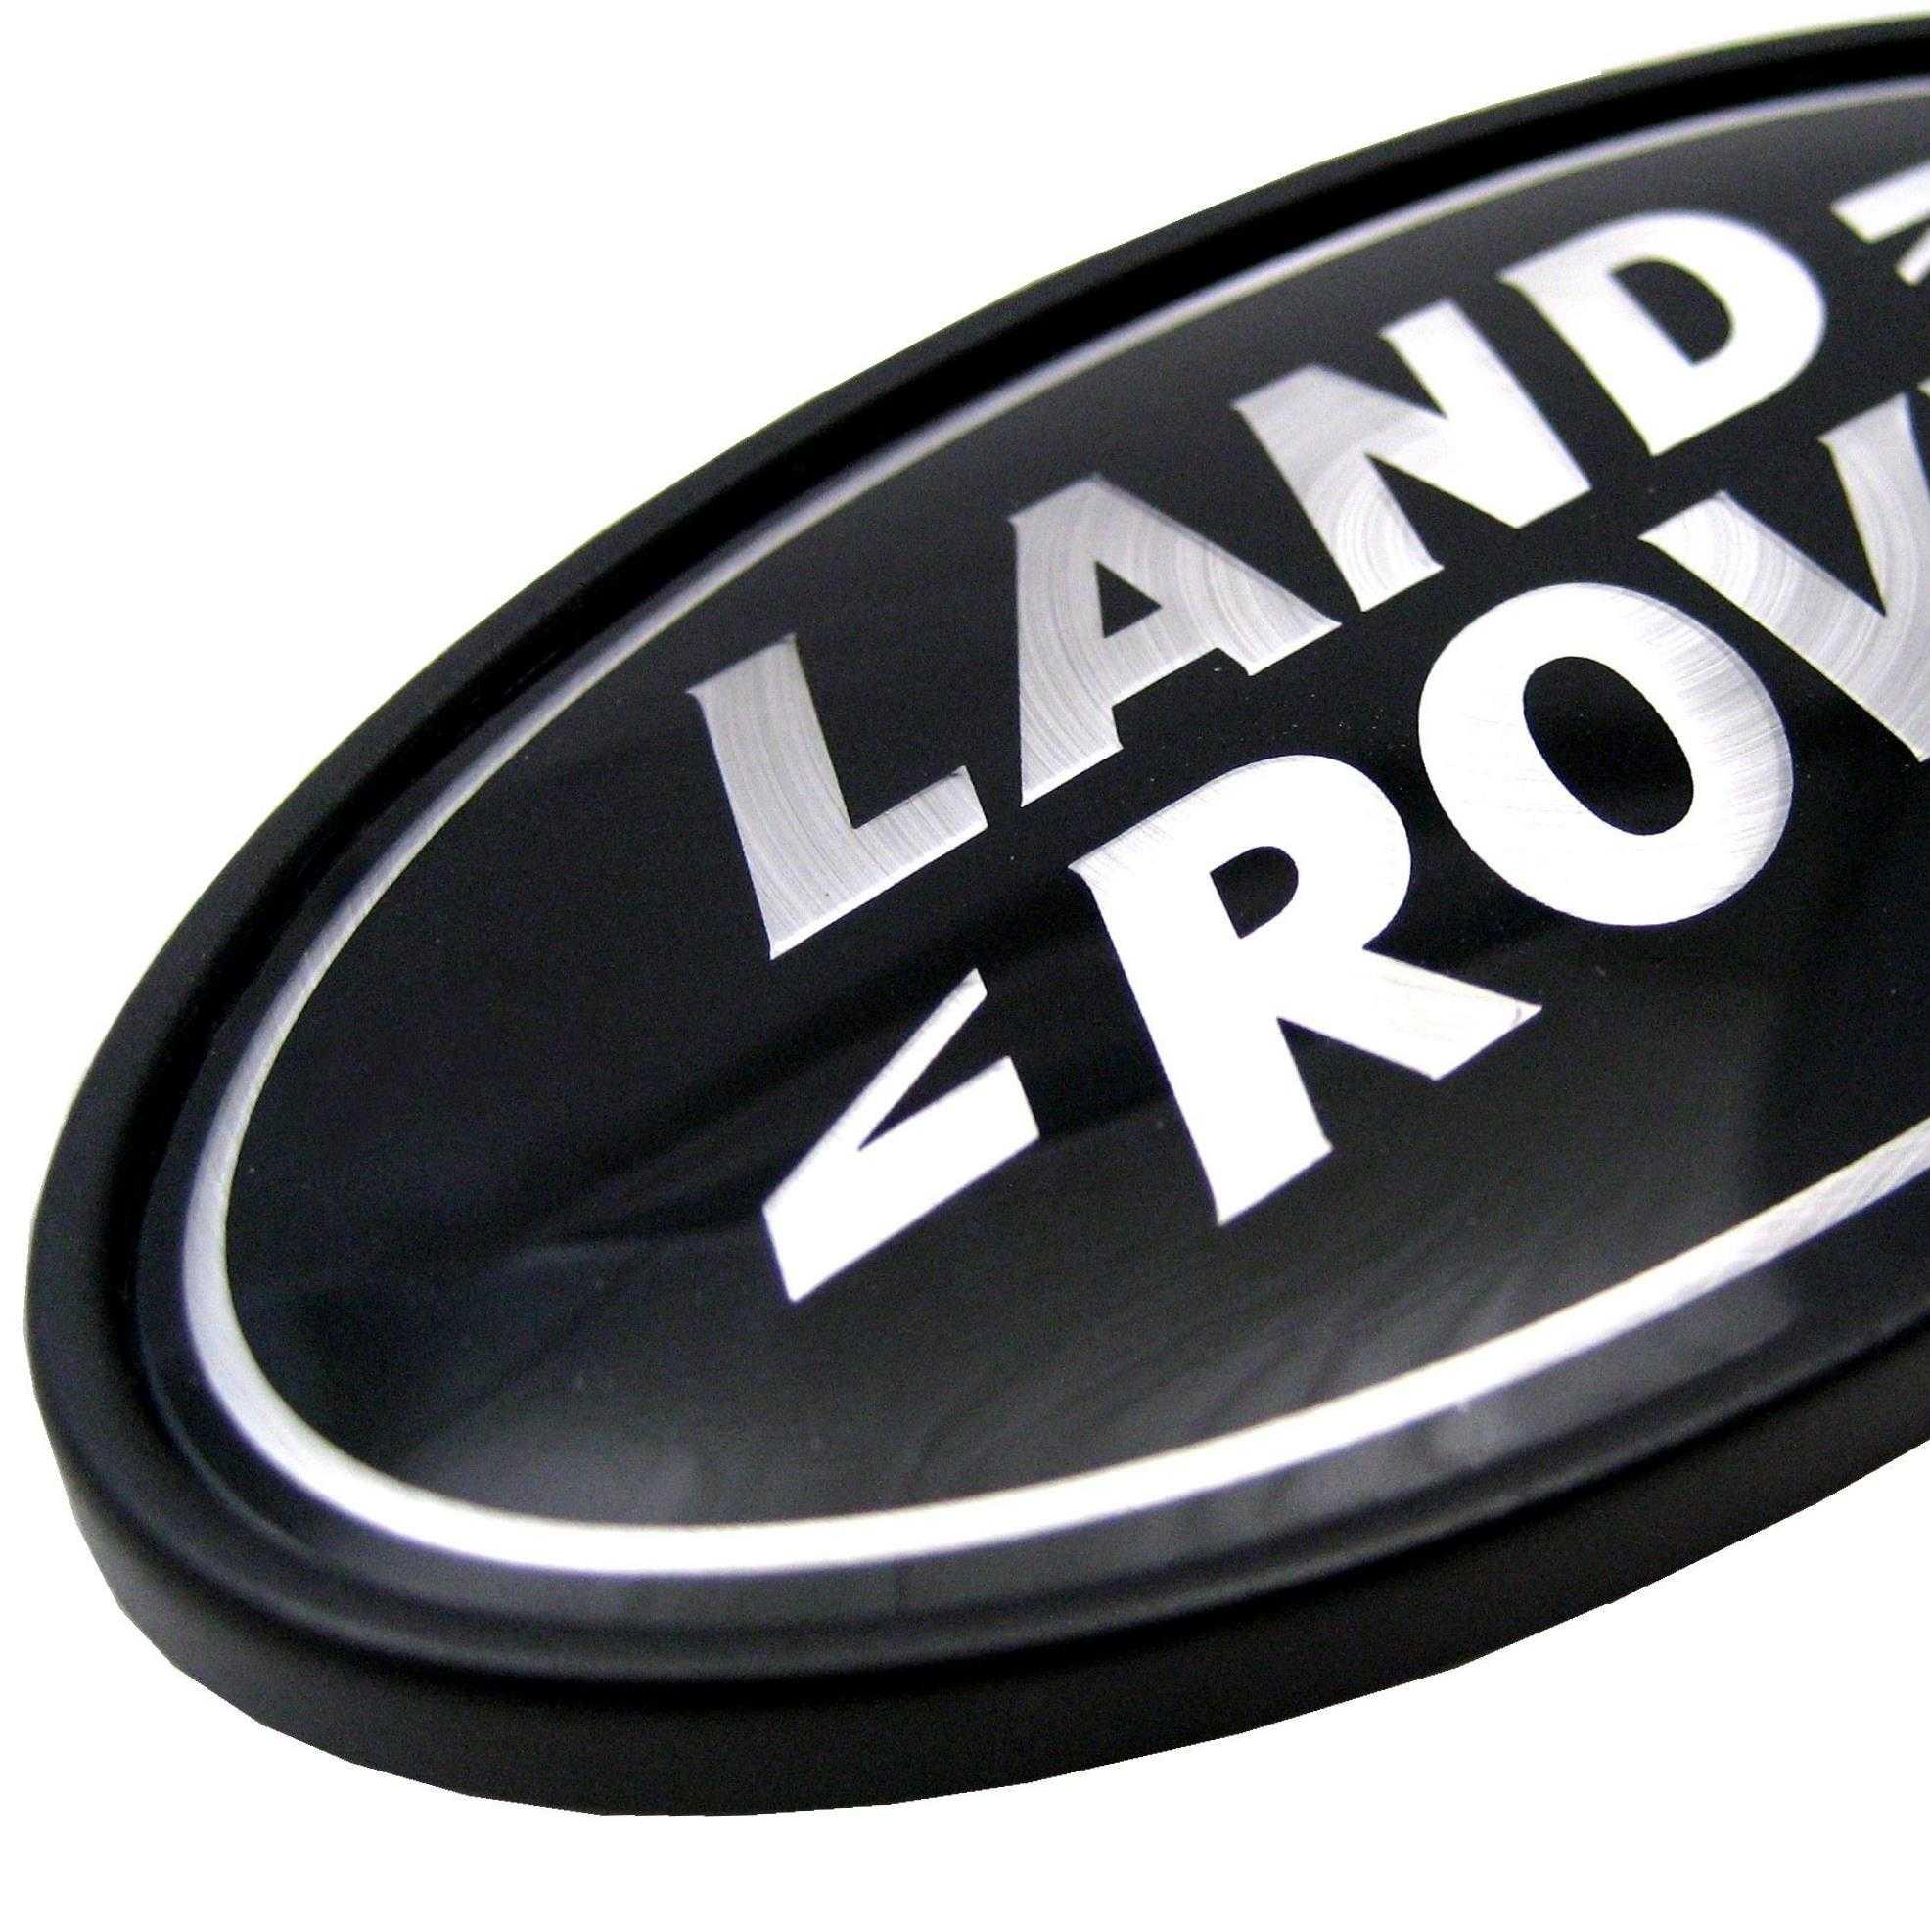 Land Rover Discovery Blacksilver Oval Rear Badge Upgrade 1 2 3 Lr3